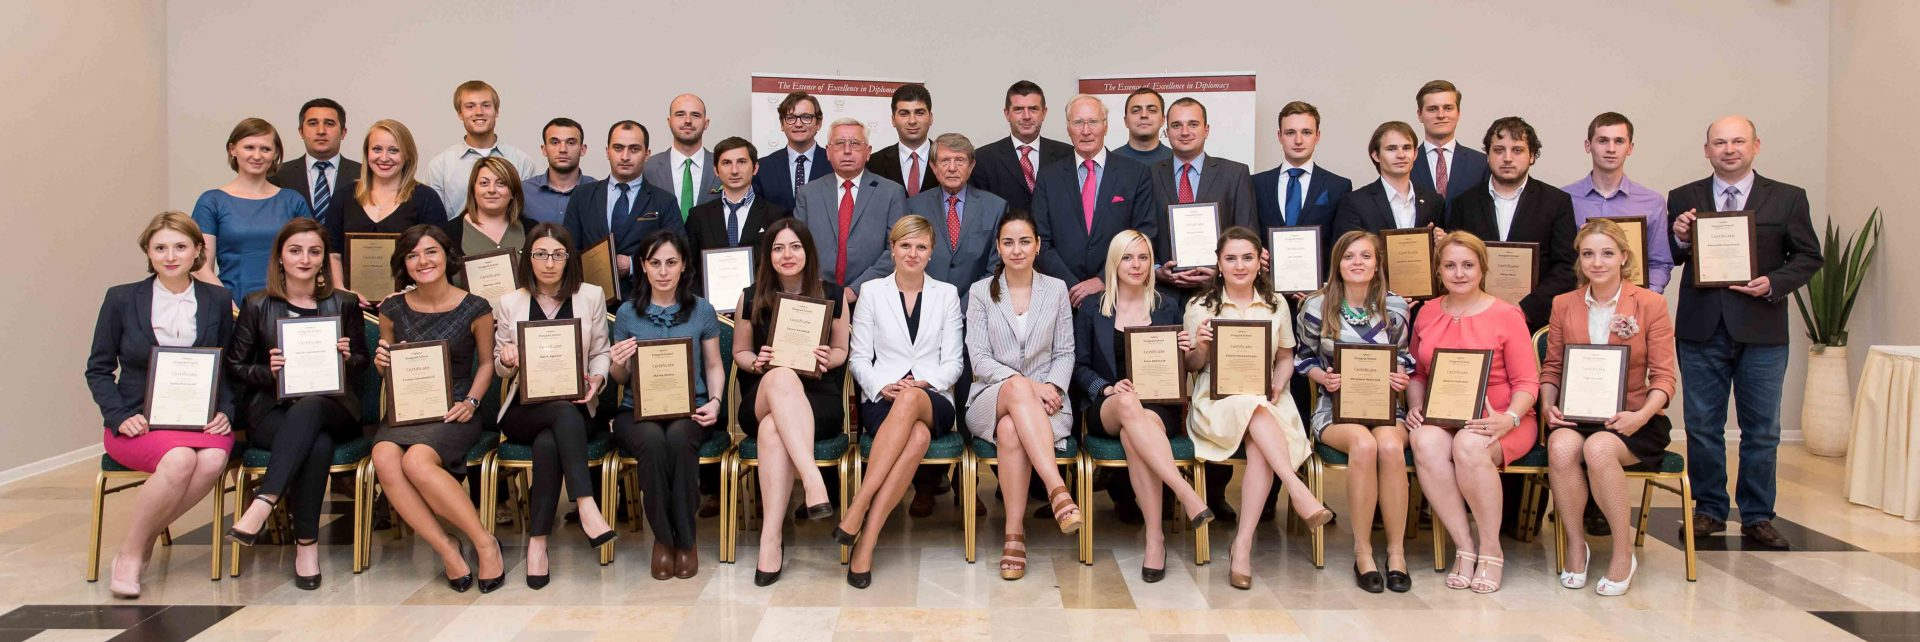 Nominacje doNagrody Alumn Roku 2016